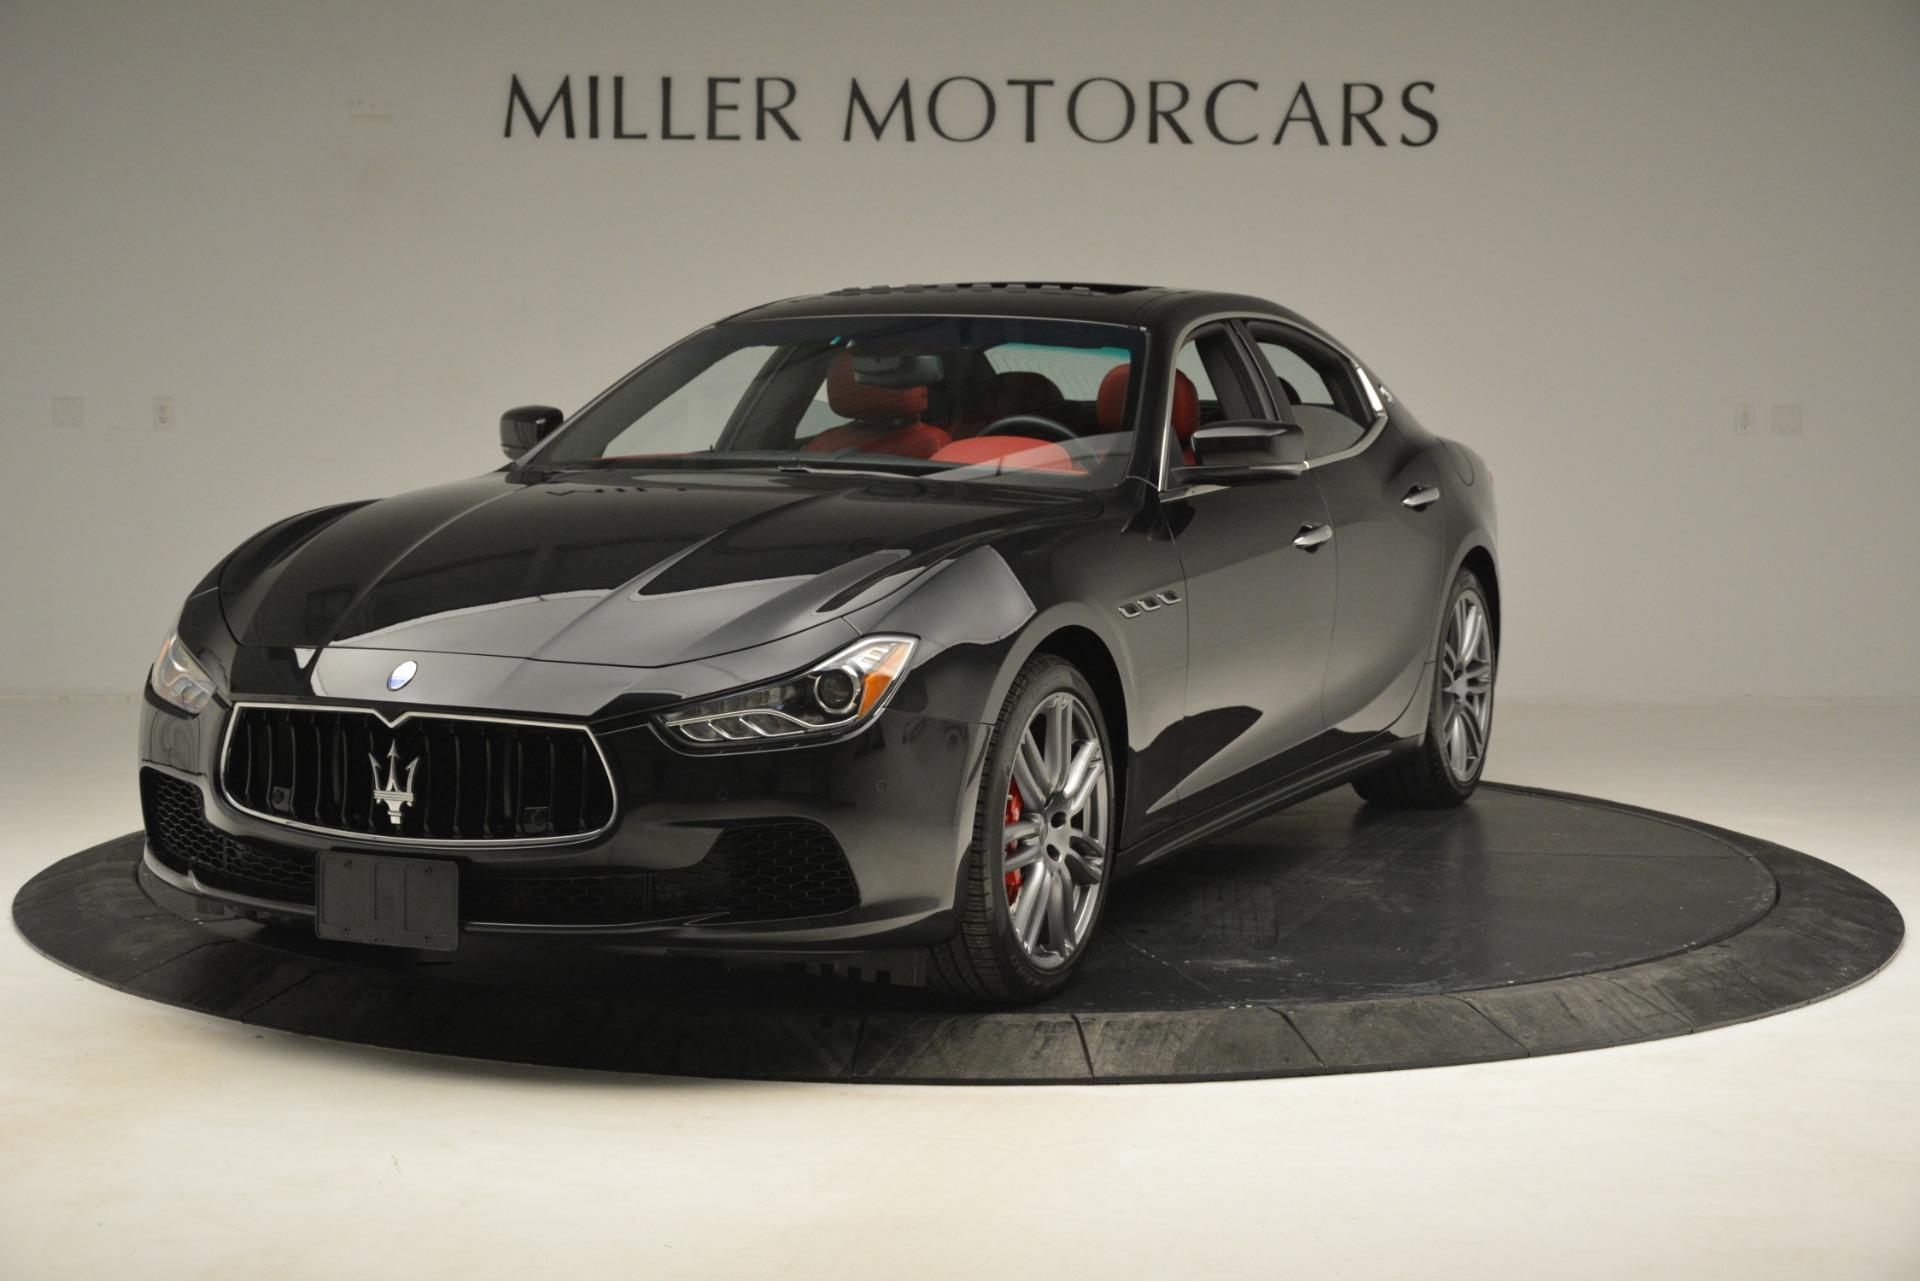 Used 2016 Maserati Ghibli S Q4 For Sale In Greenwich, CT 2945_main